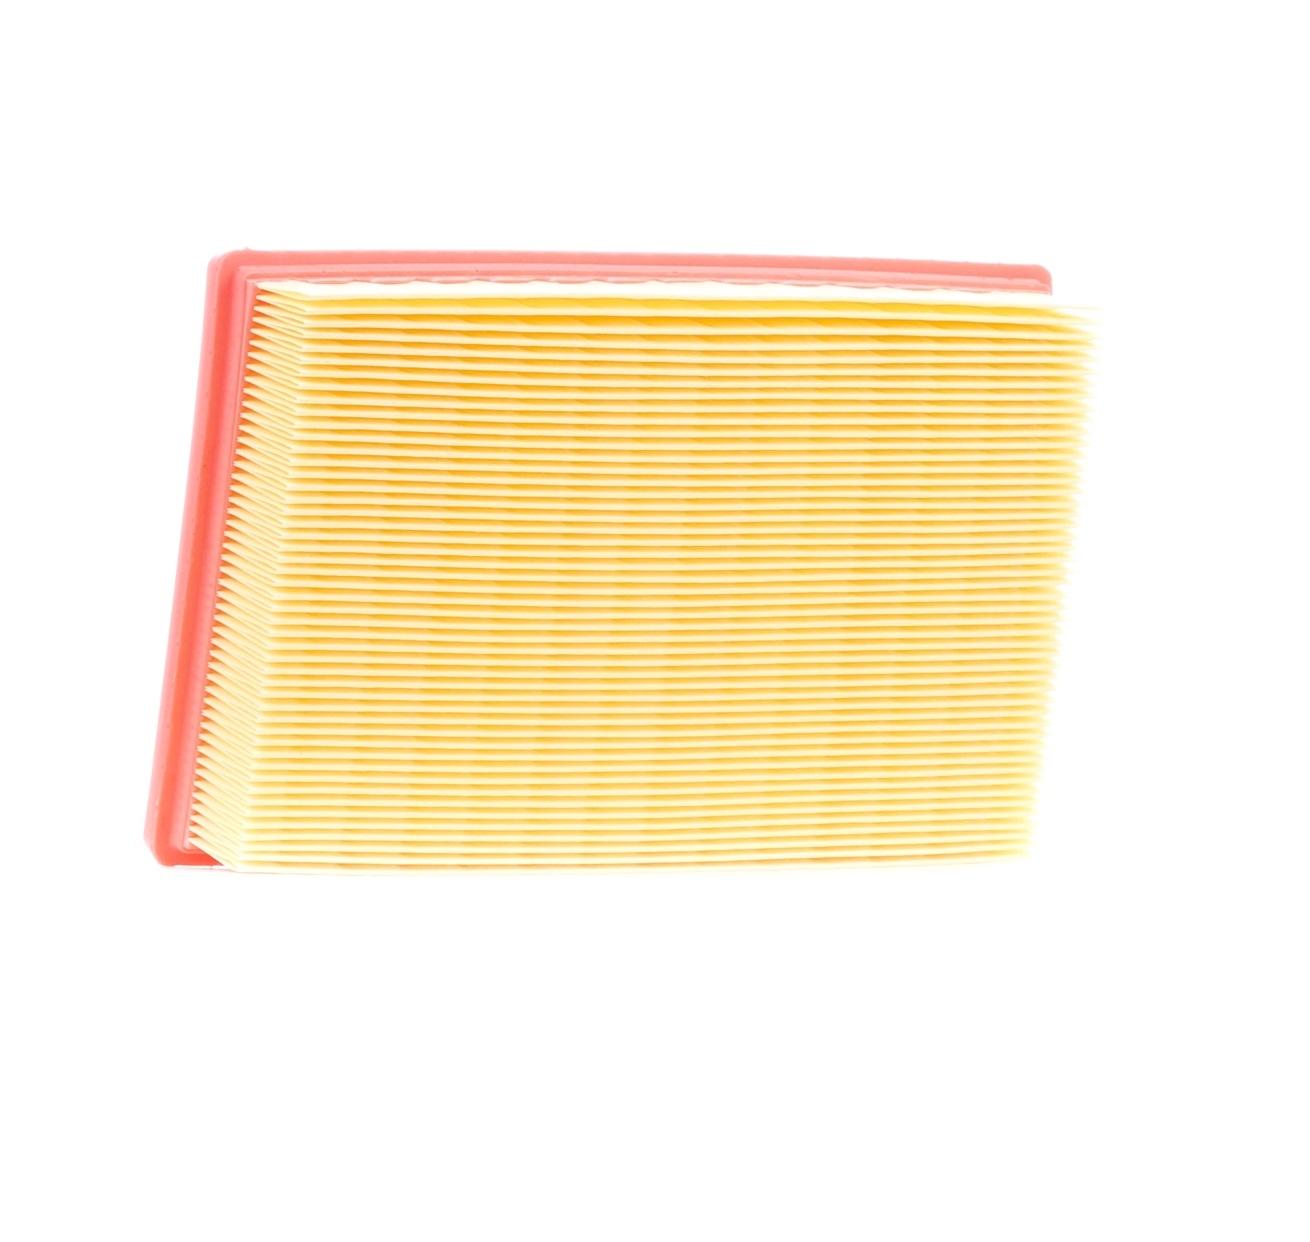 Original Zracni filter 8A0205 Suzuki